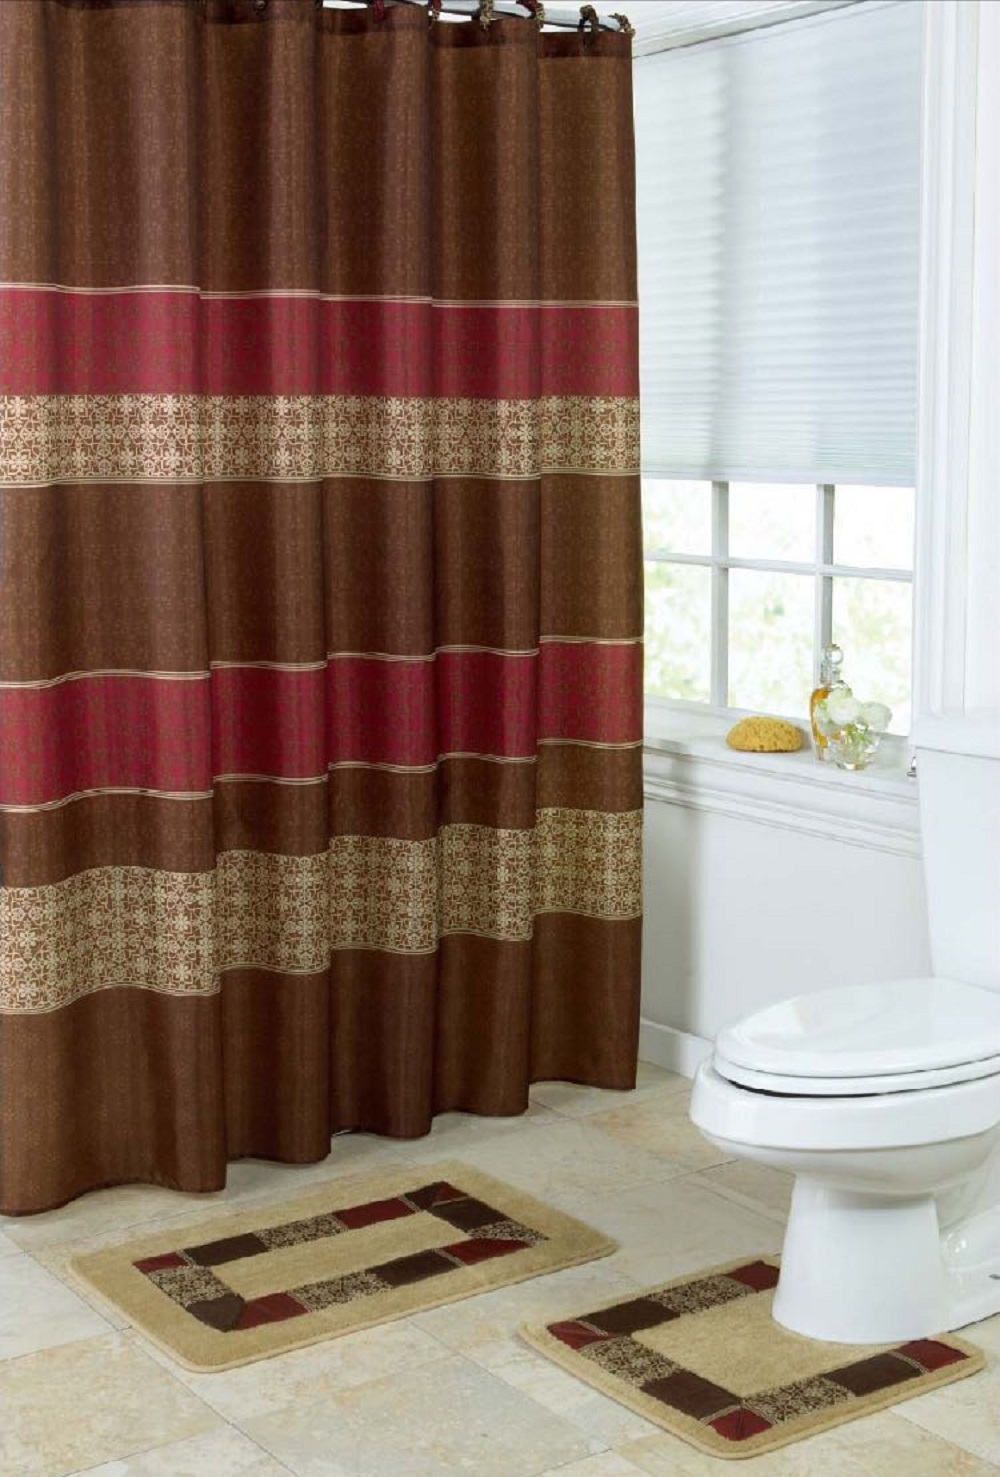 15 piece bath set 2 taupe brown burgundy bathroom mats 1 matching shower curtain 12 fabric rings medici walmart com